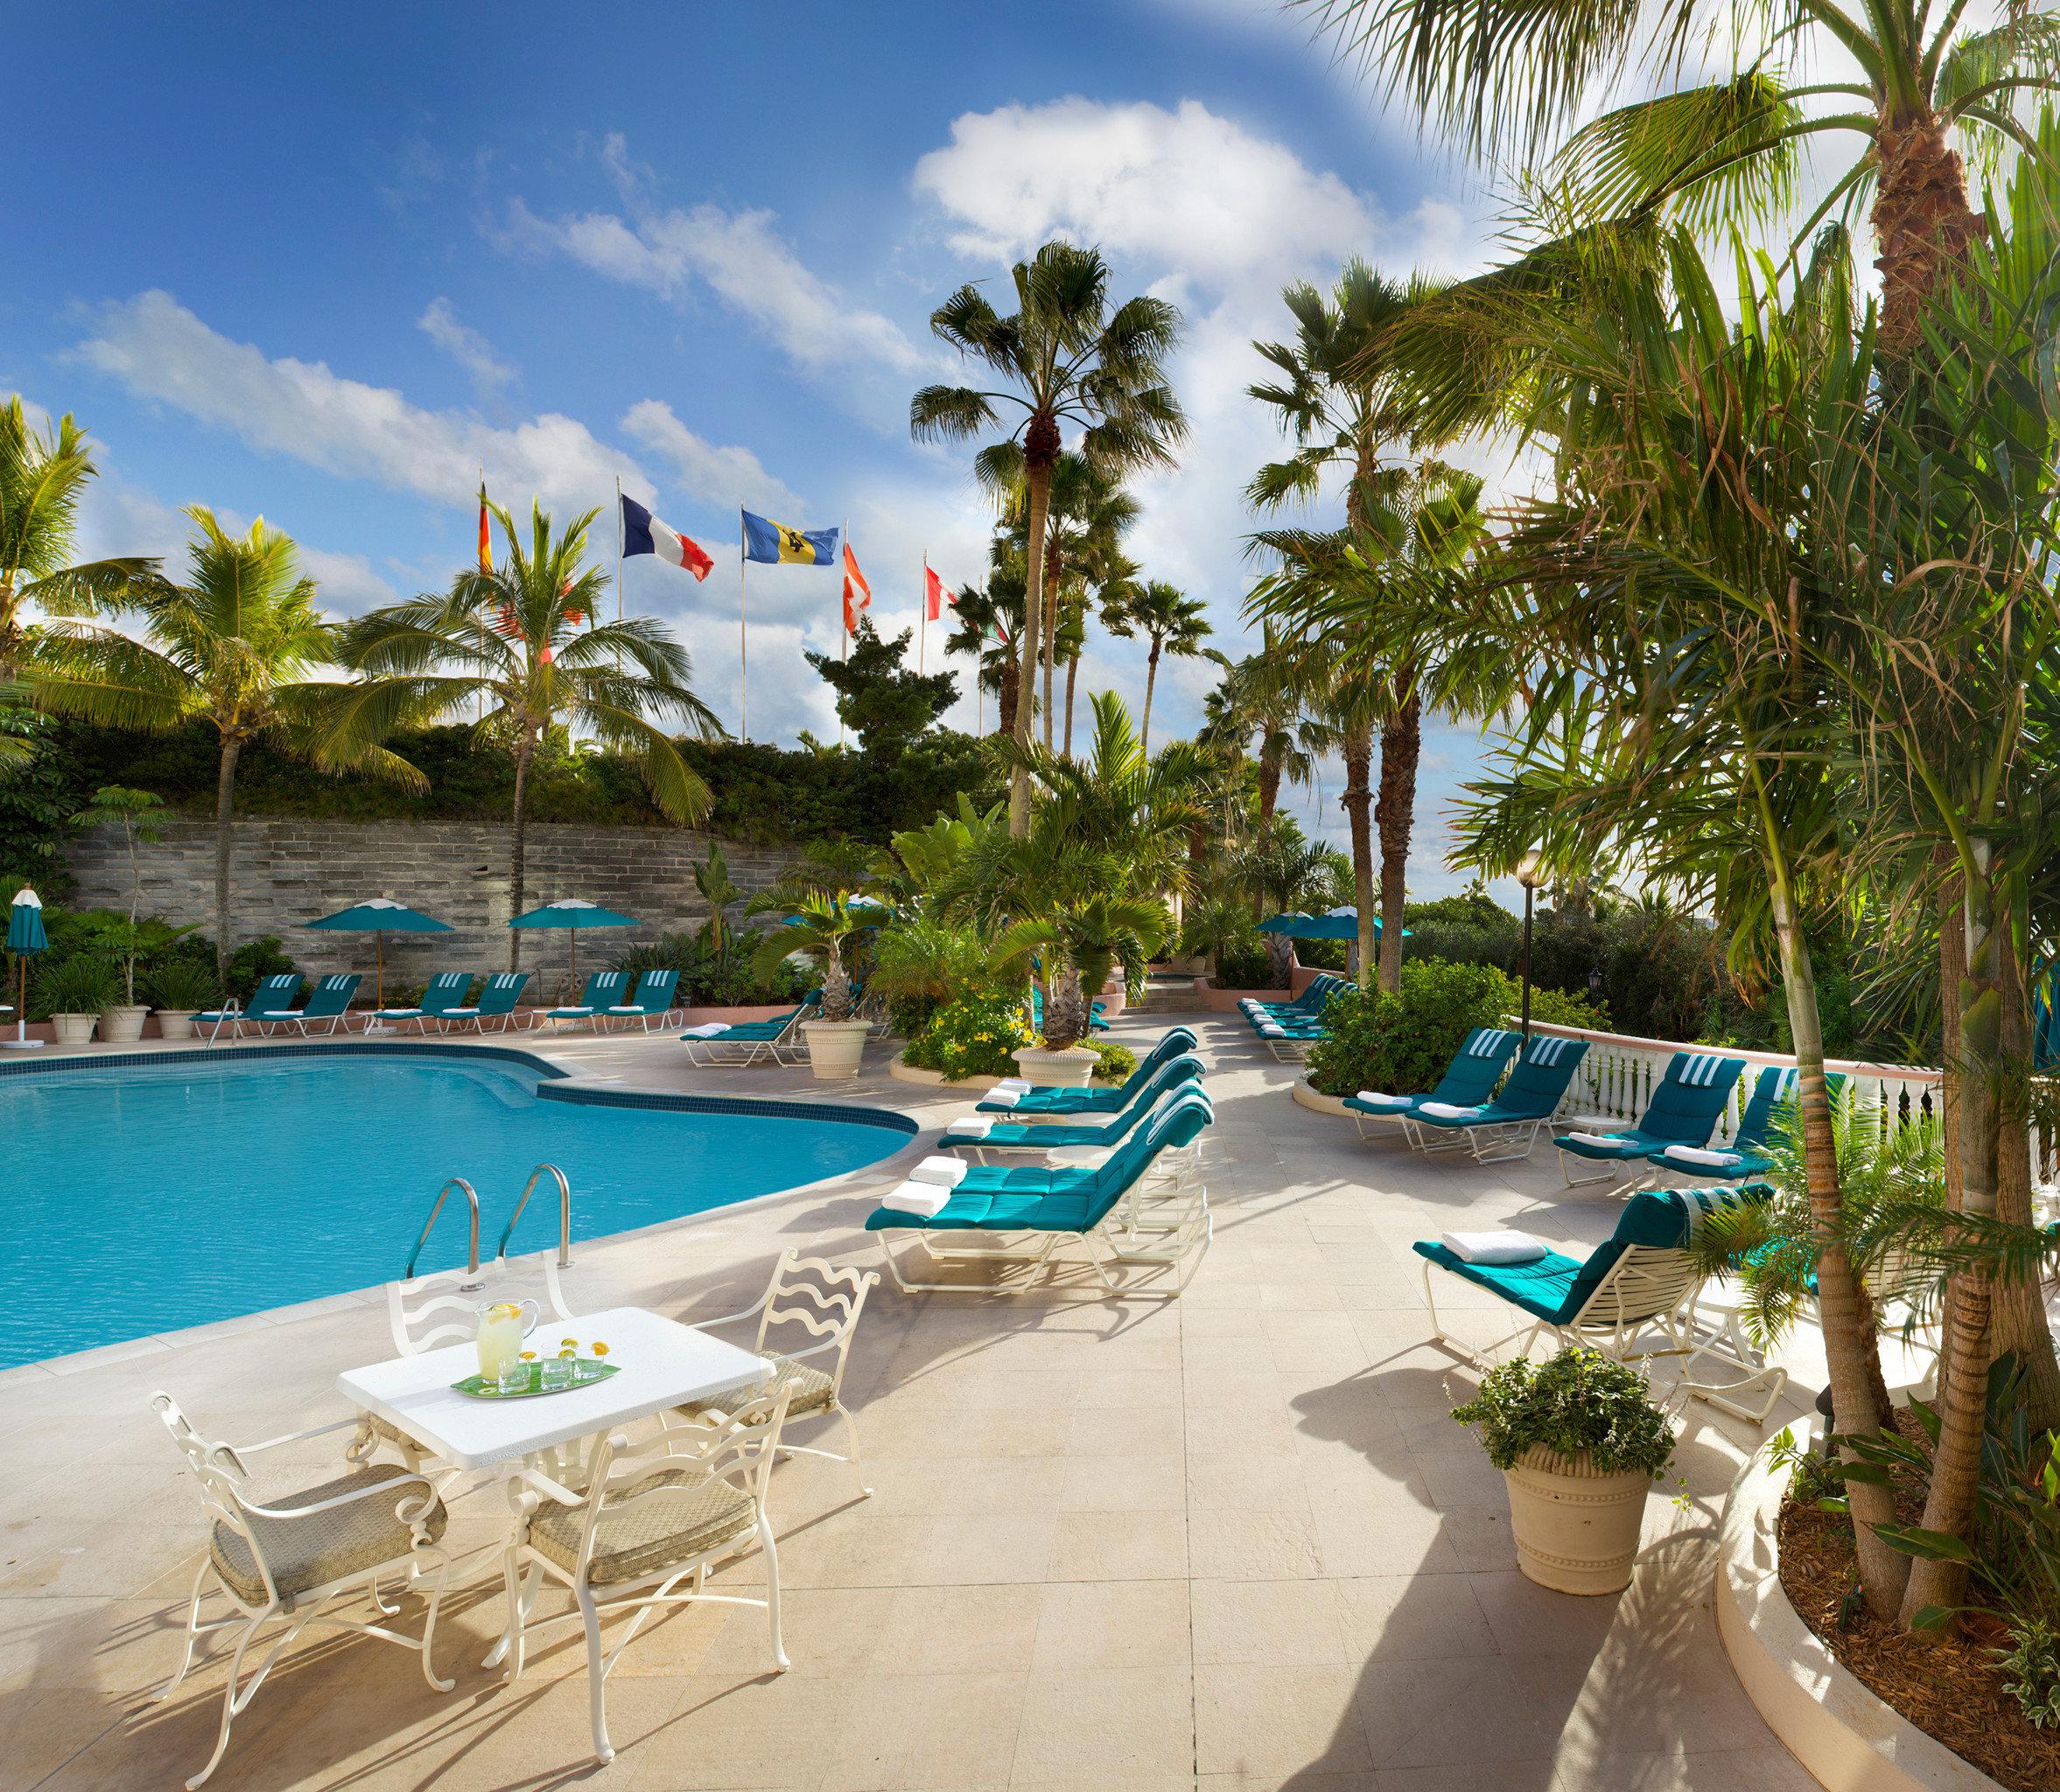 Hotels Lounge Luxury Pool tree sky leisure swimming pool property Resort Beach palm caribbean condominium lined Villa lawn Water park tropics arecales sandy shore day